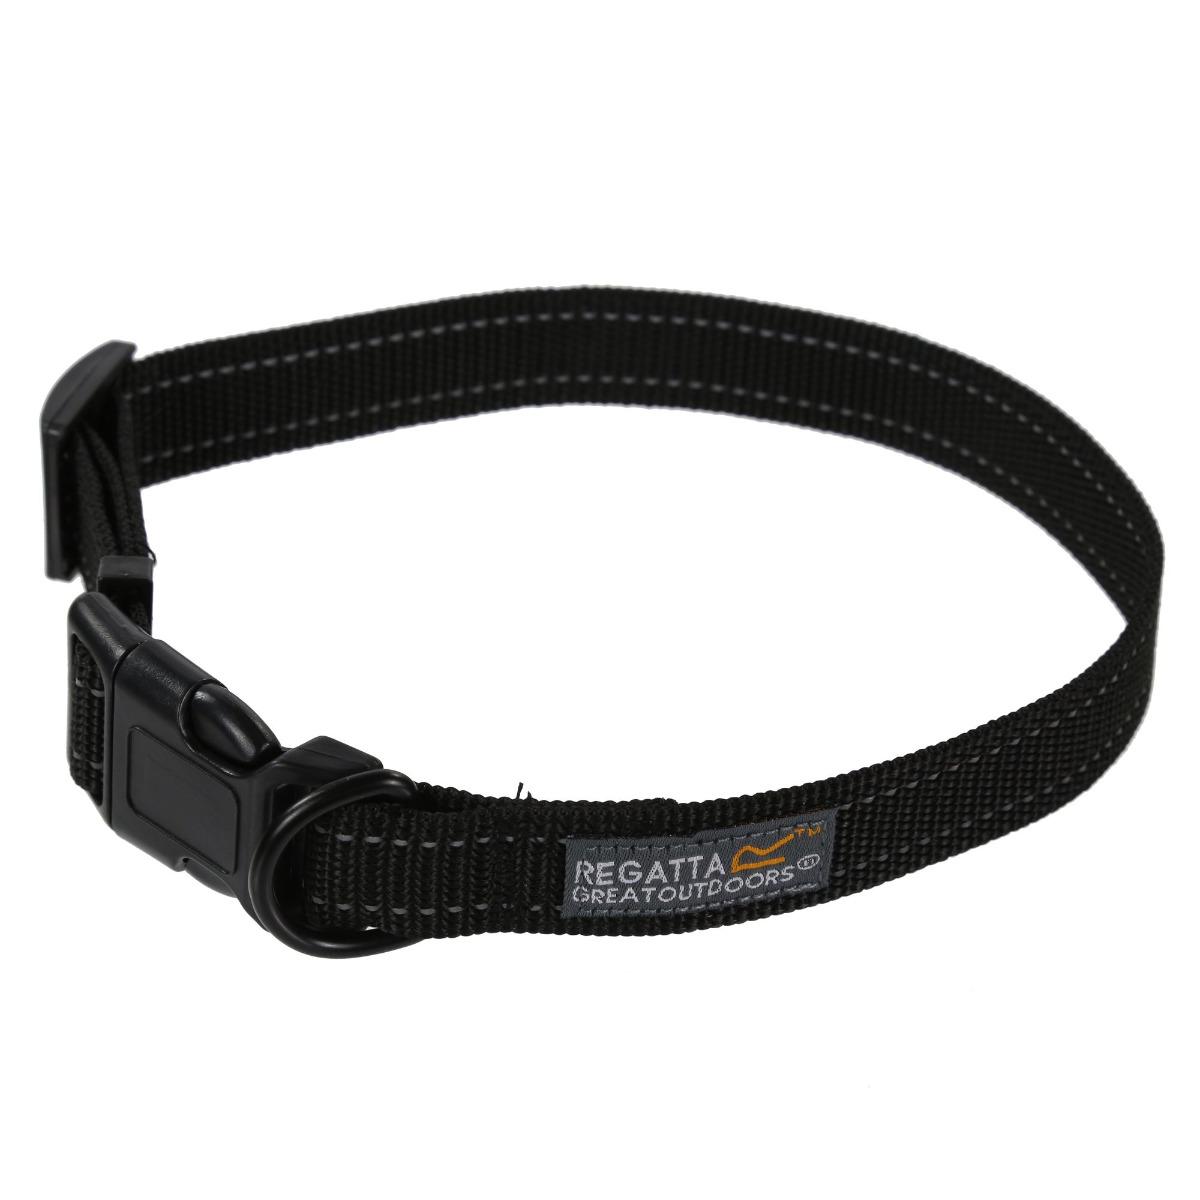 Regatta Comfort Dog Collar - Black - 30 - 55